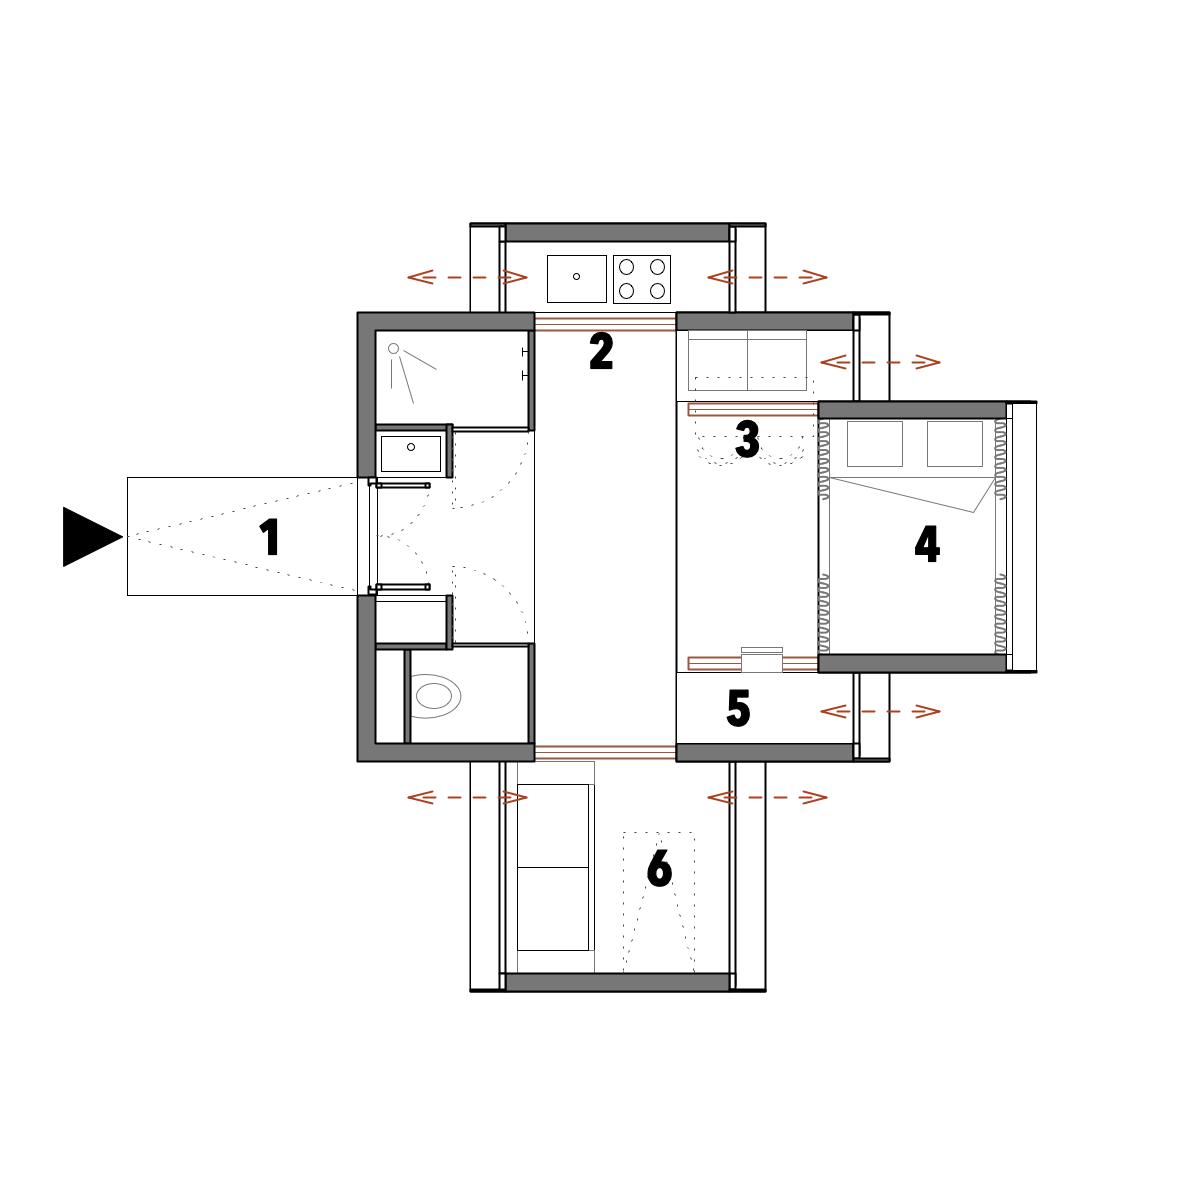 christophe-benichou-architectures-photo-house-08